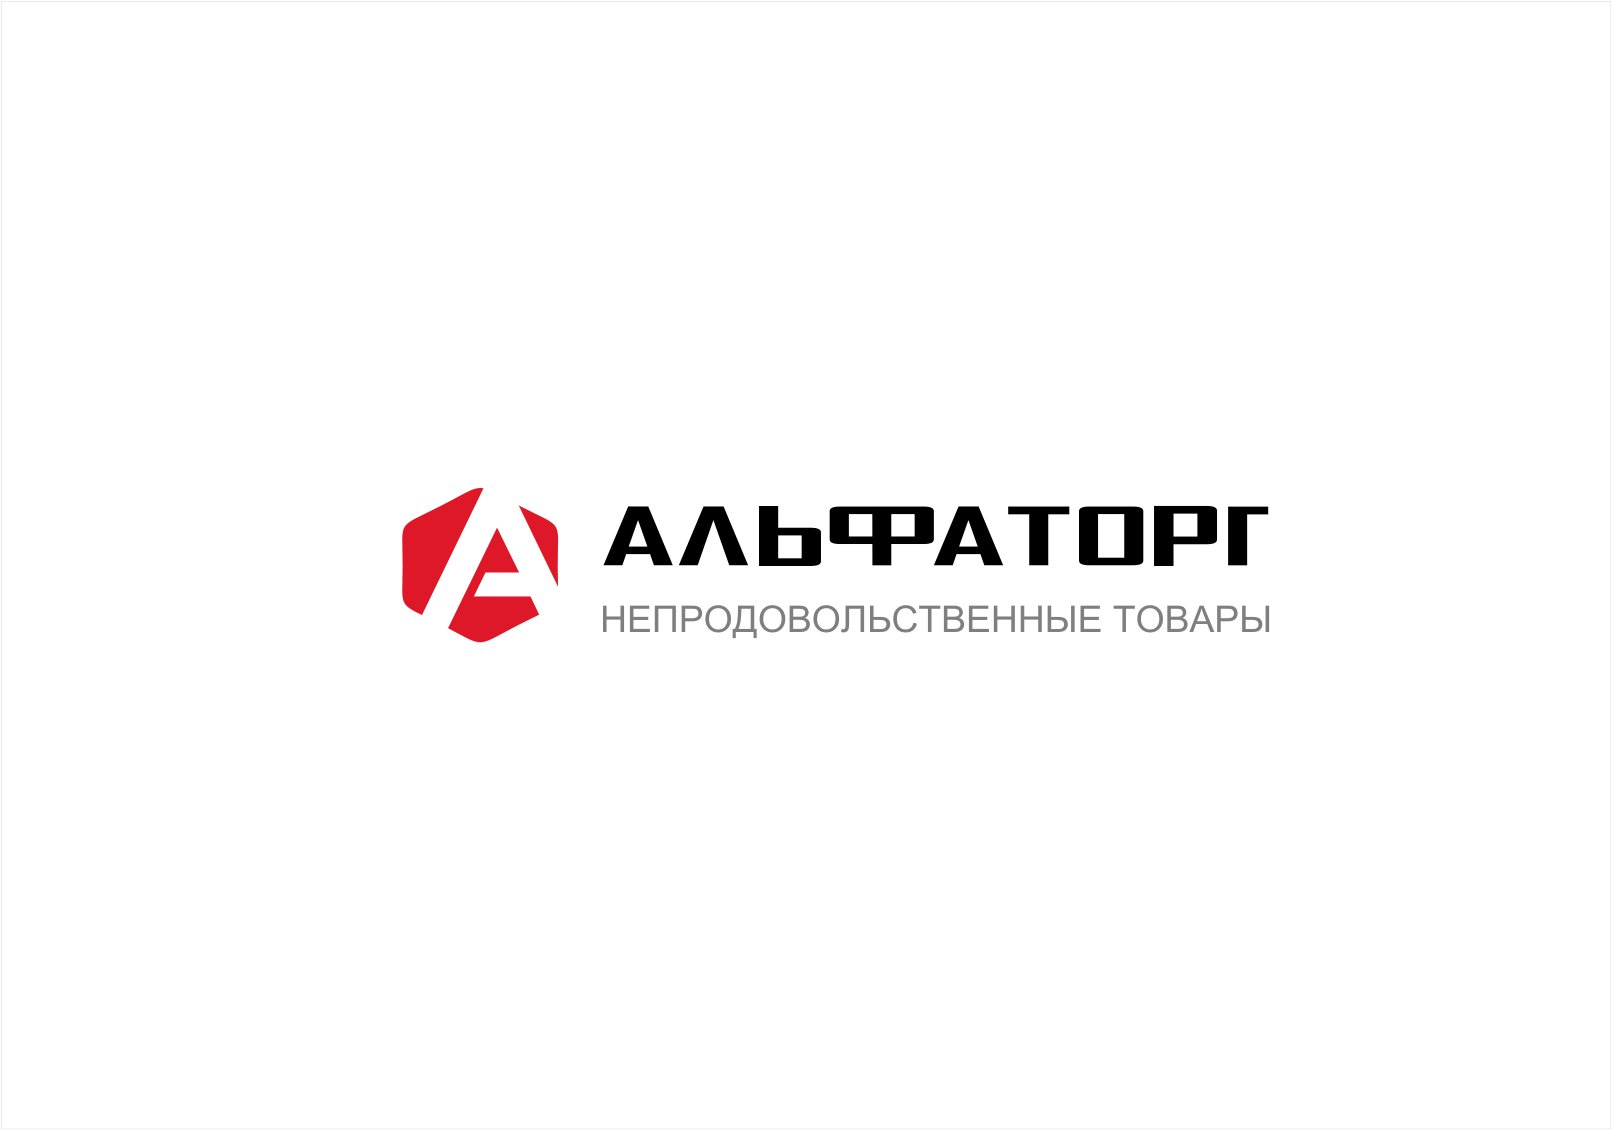 Логотип и фирменный стиль фото f_5045f0b644eb200a.jpg